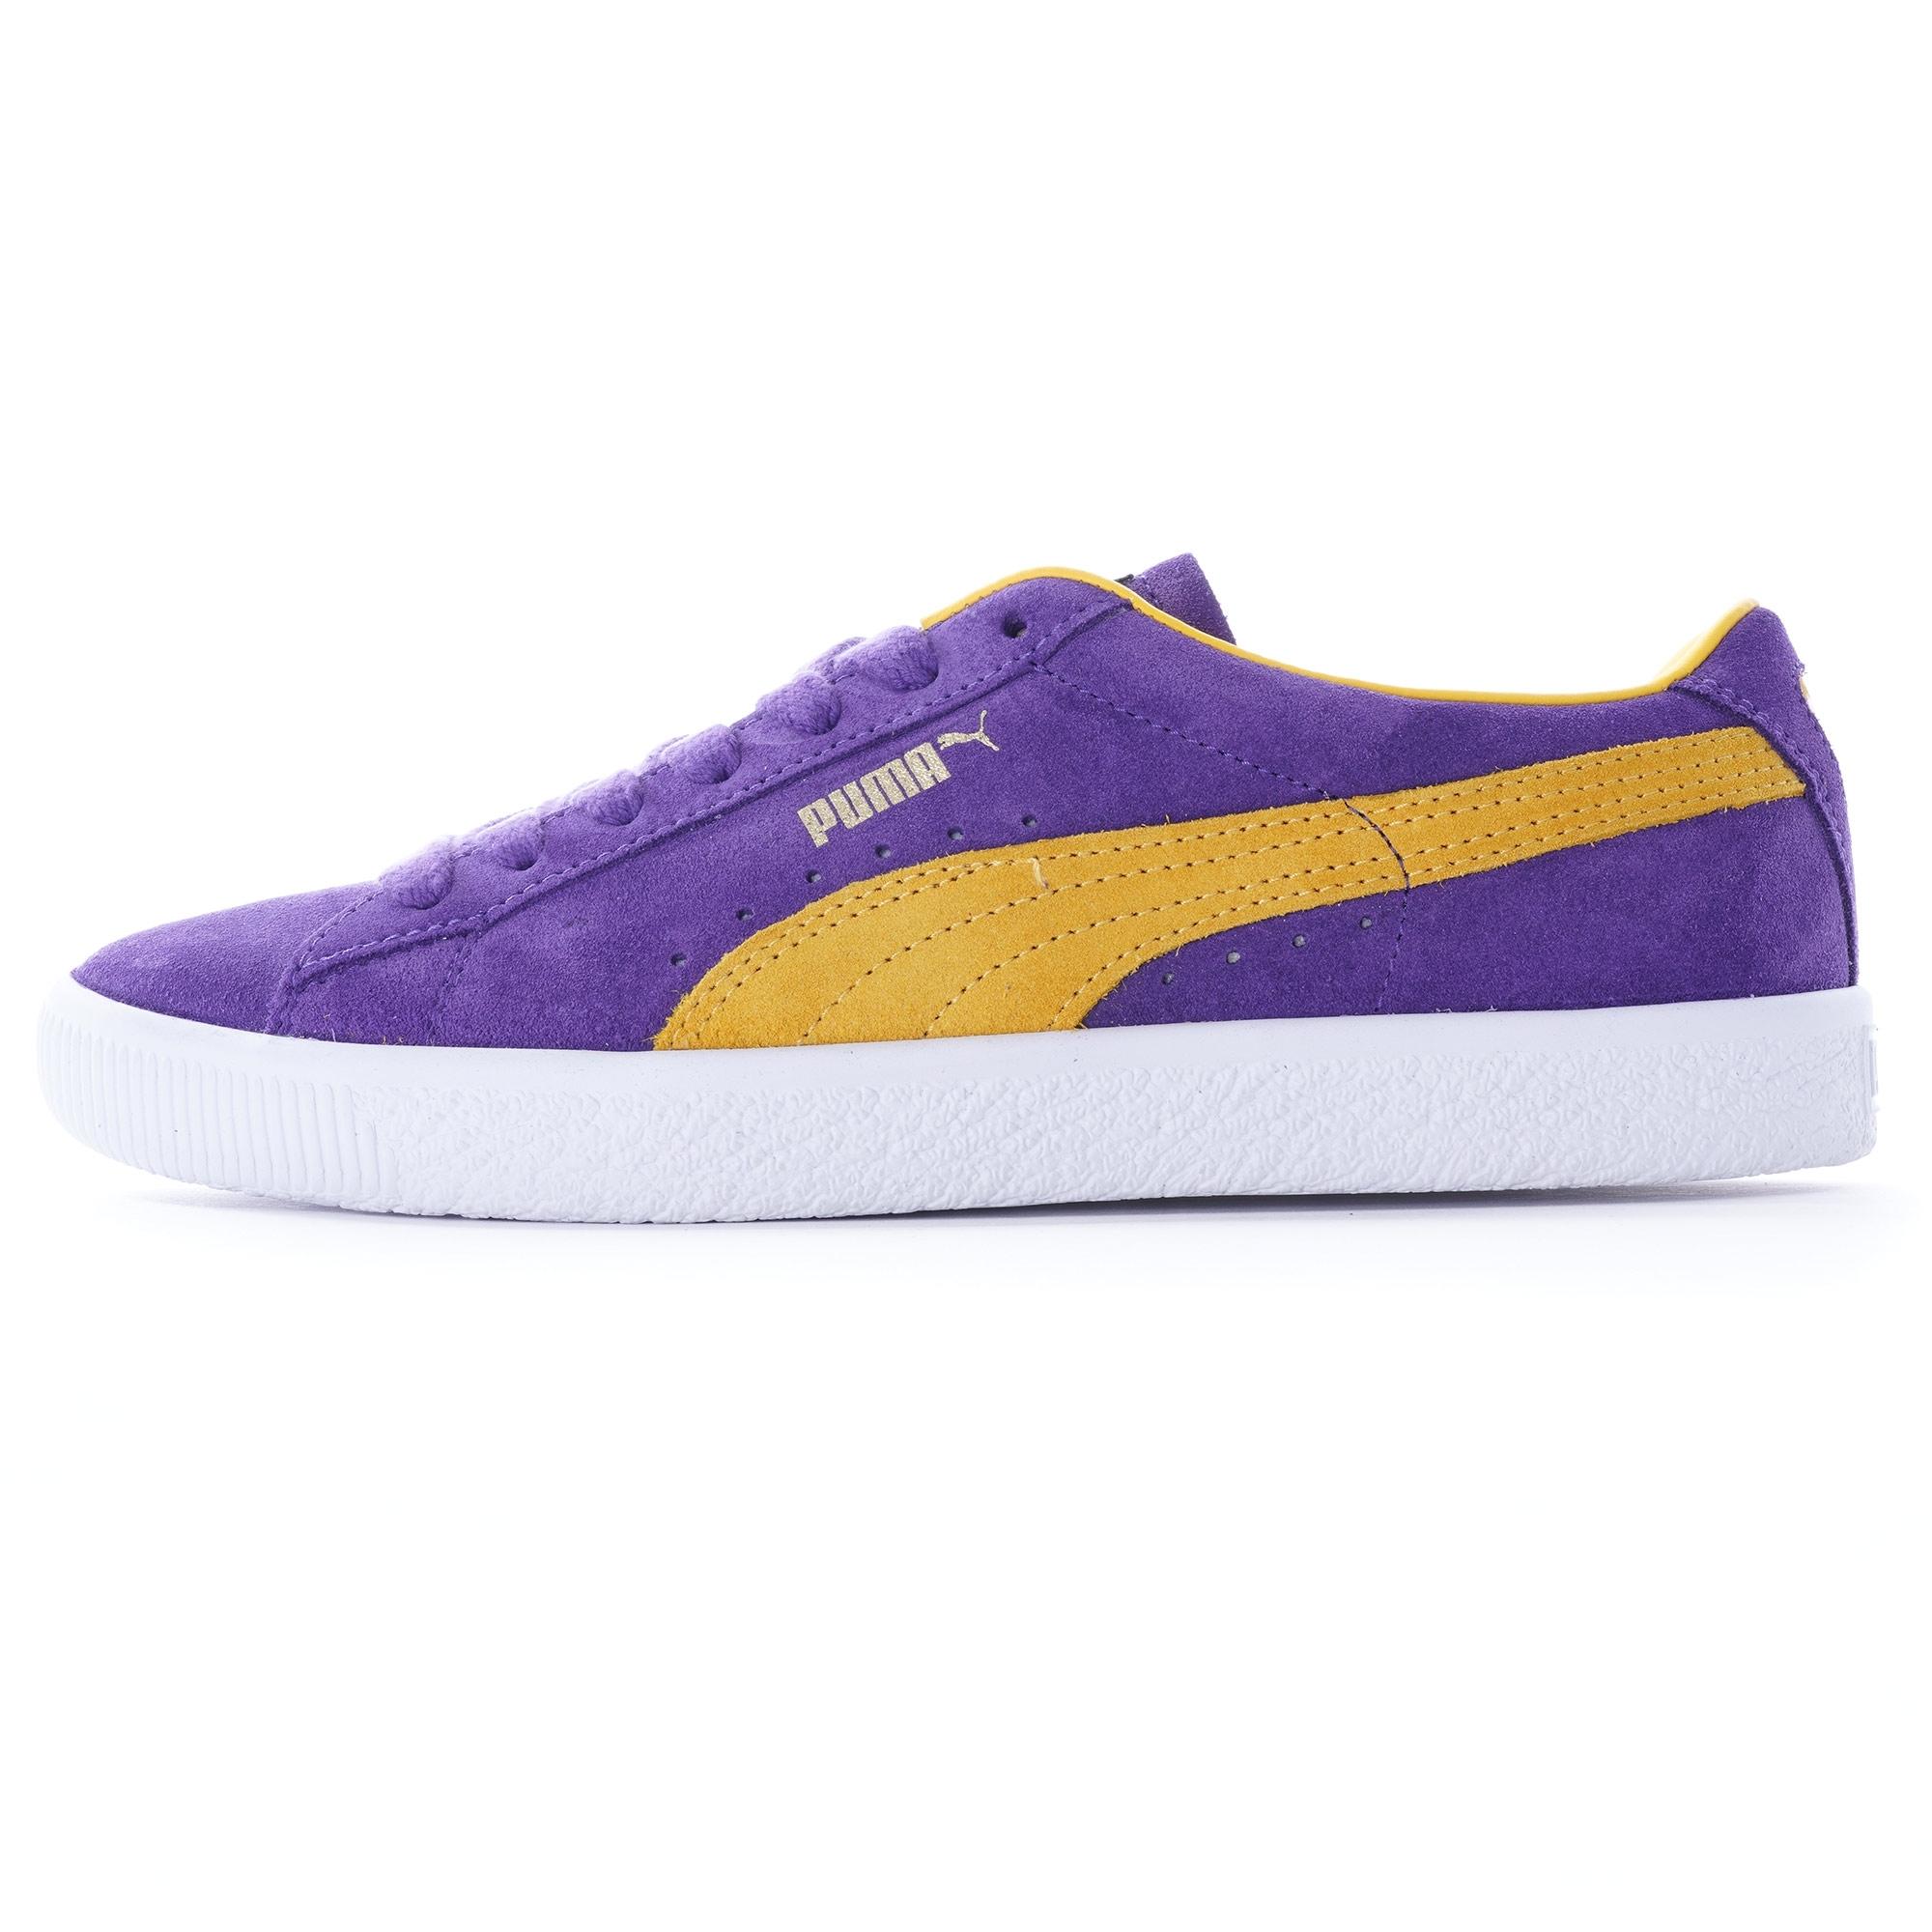 Puma Suede VTG - Purple/Yellow